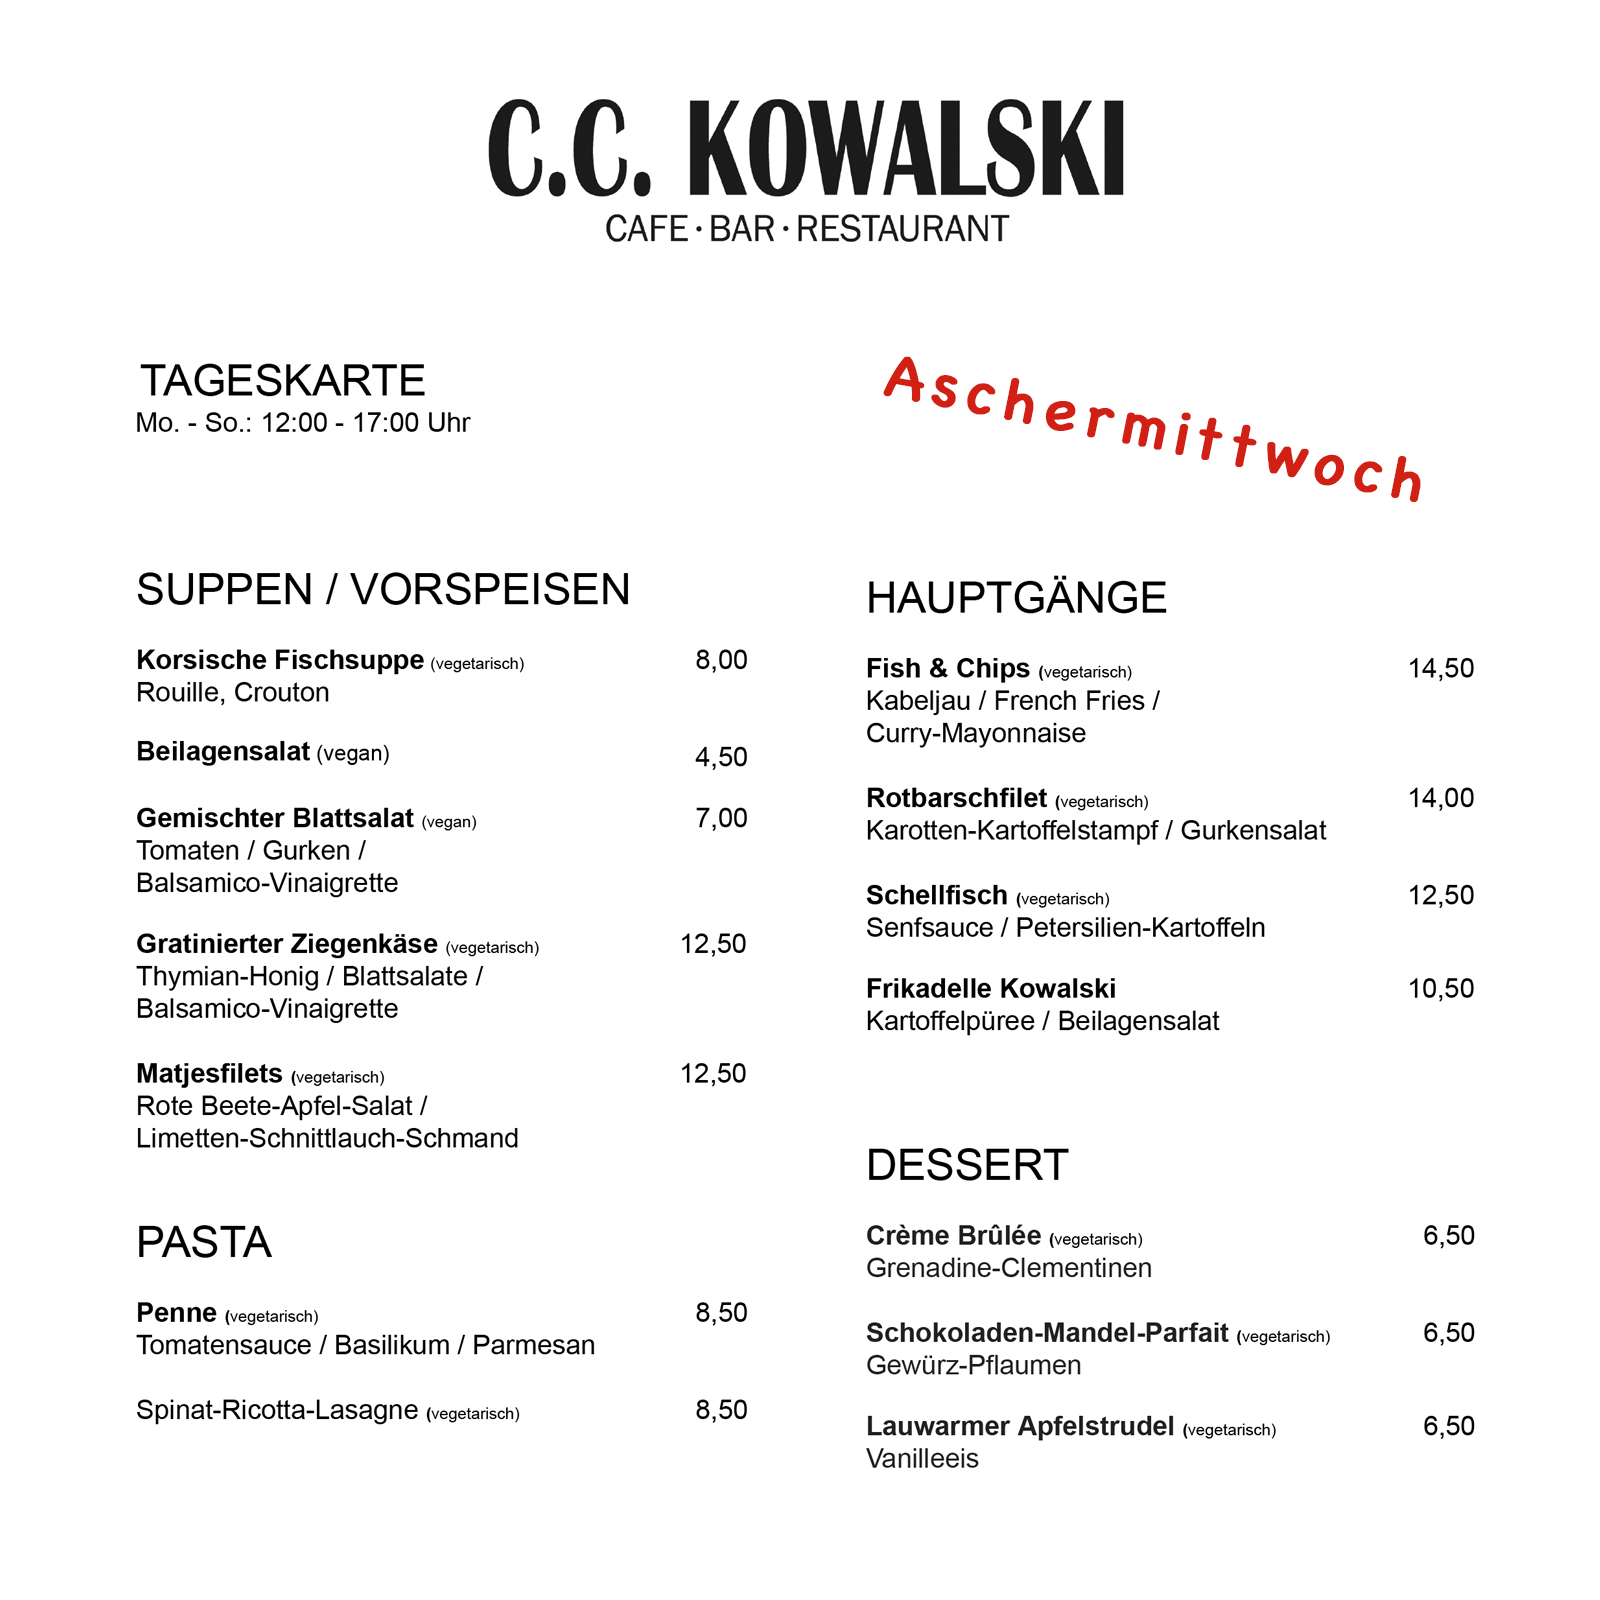 Aschermittwoch 2019 Tageskarte C.C. Kowalski